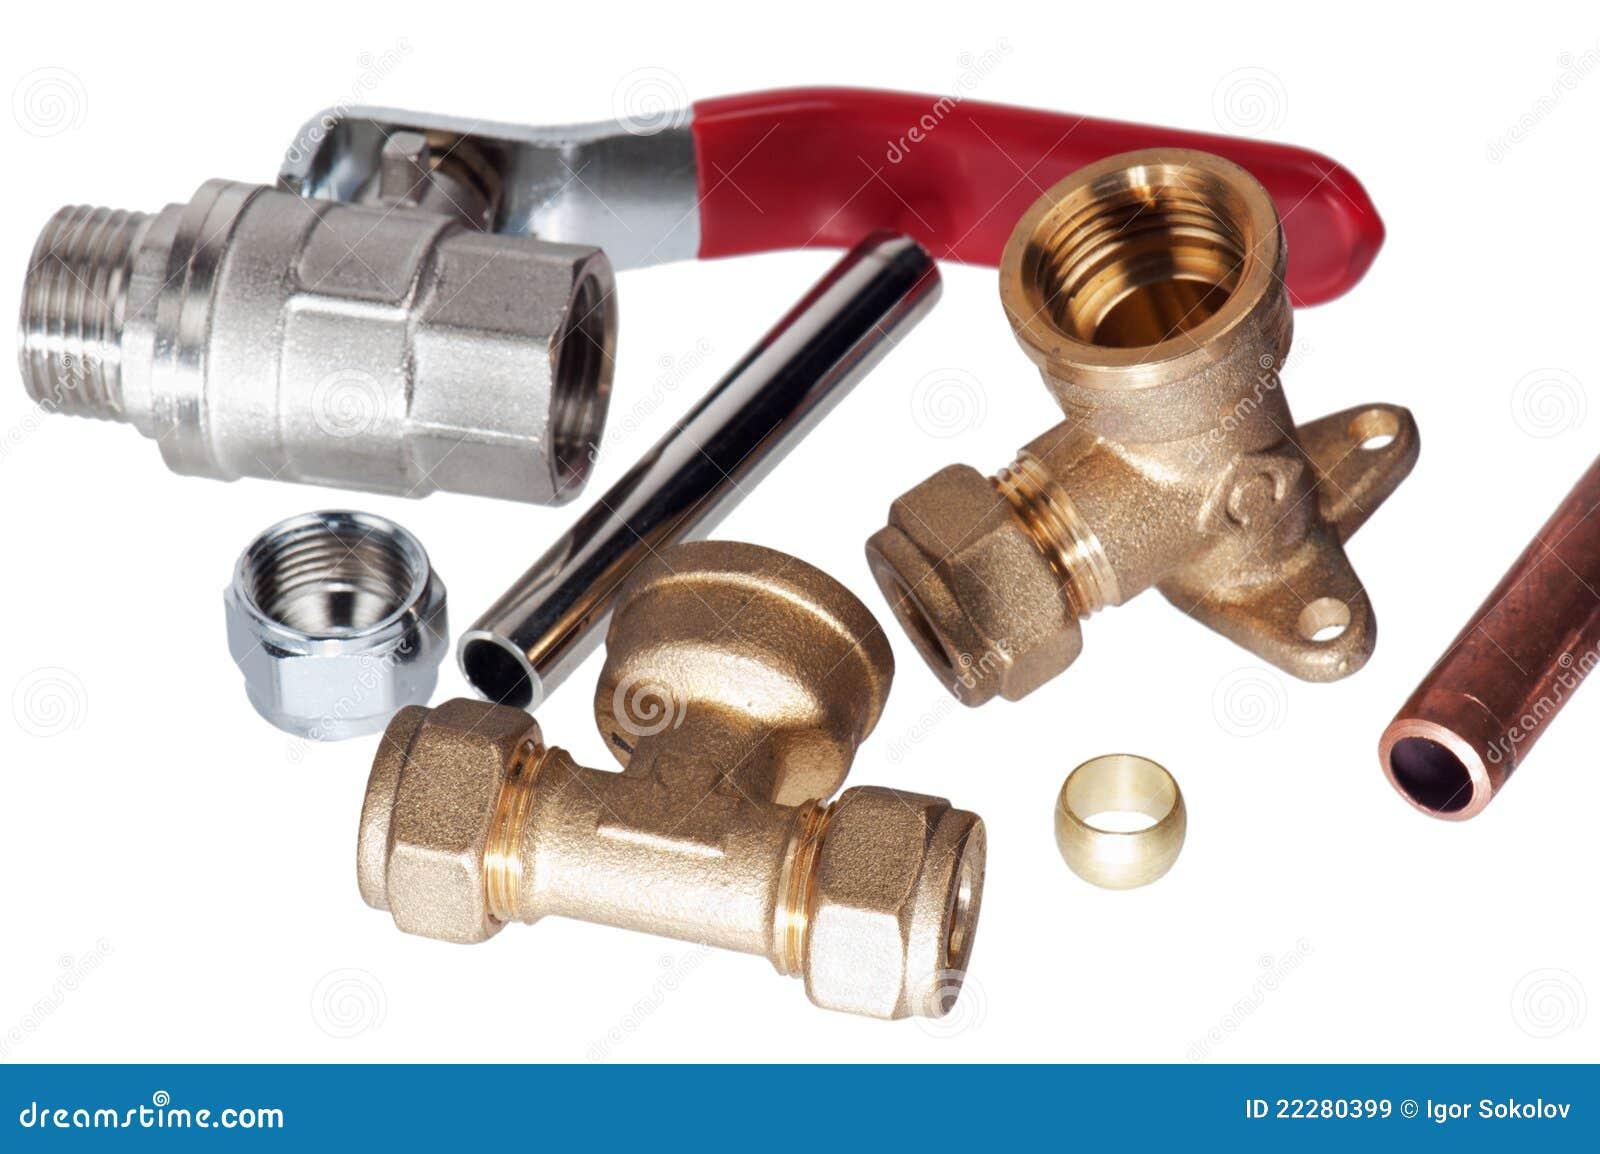 Plumbing Fixtures Royalty Free Stock Images